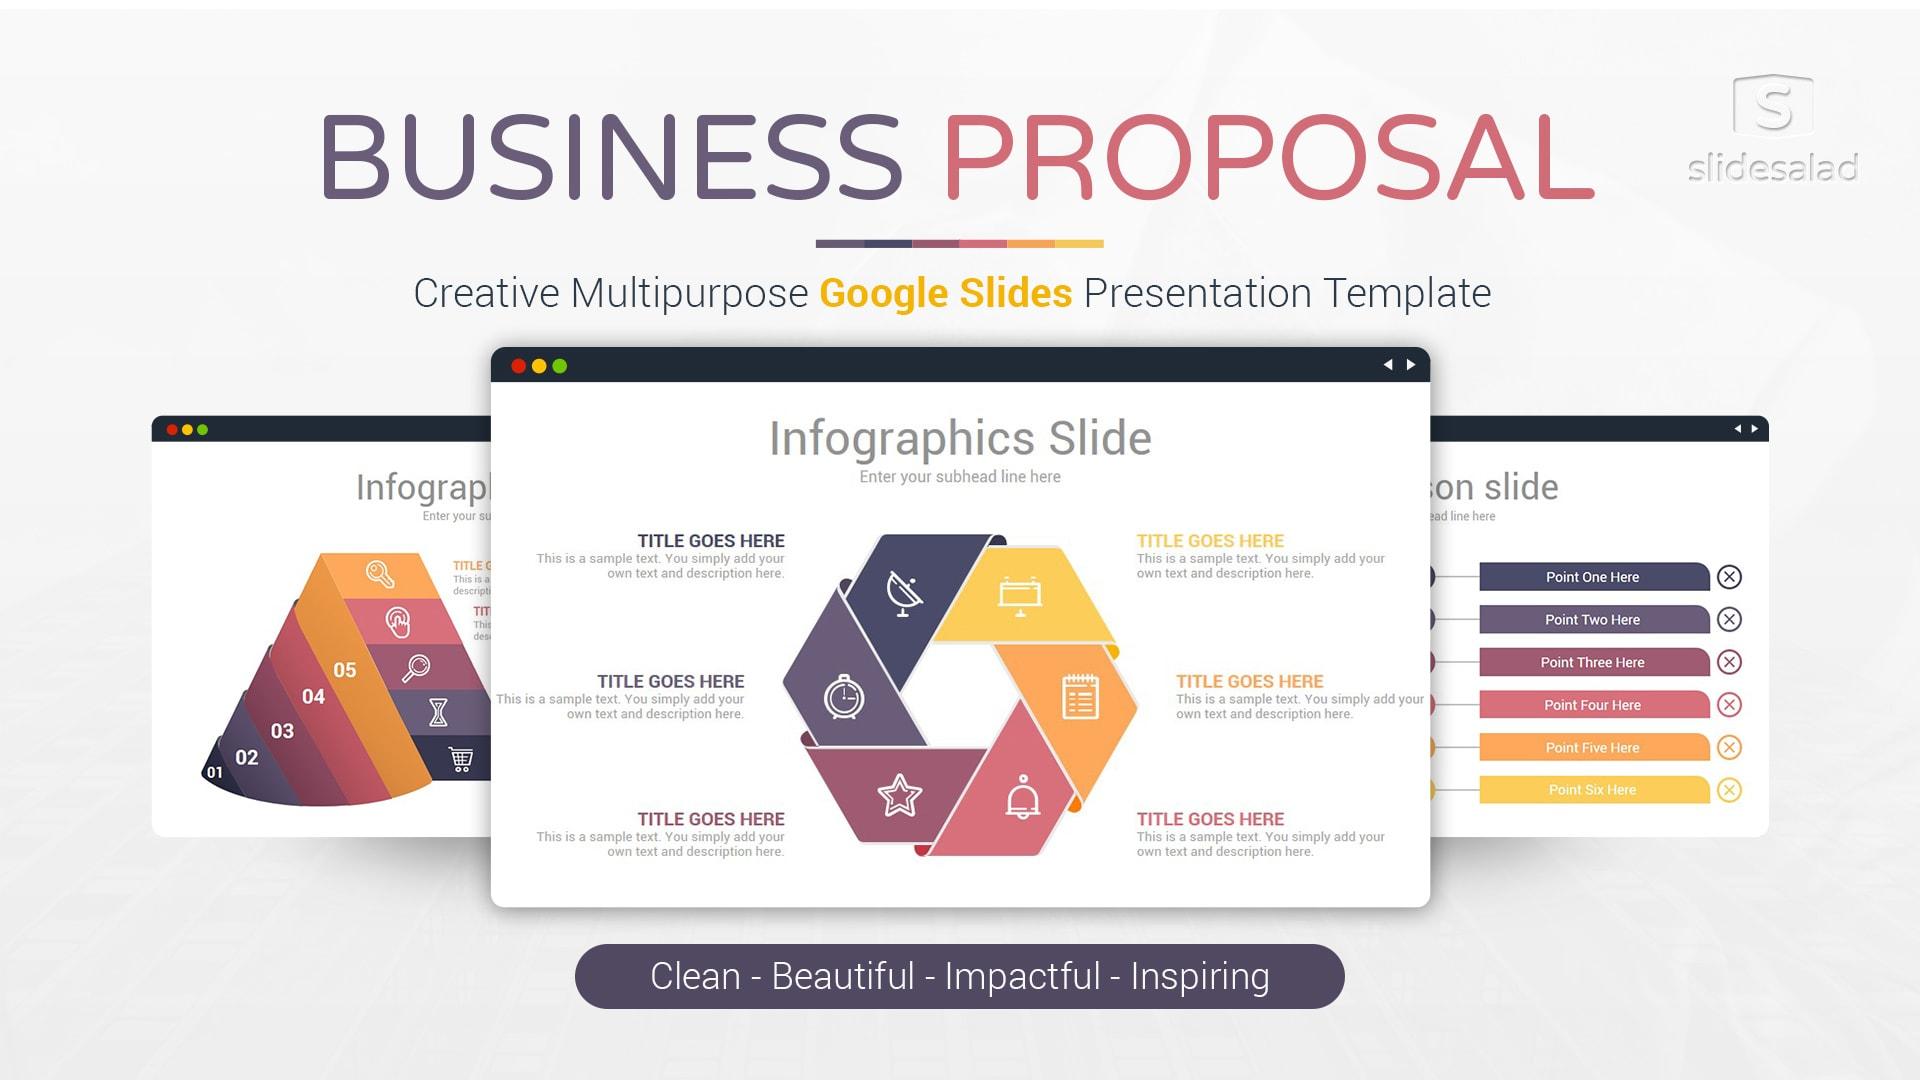 Business Proposal Google Slides Presentation Template - Top Minimalist Google Slides Theme